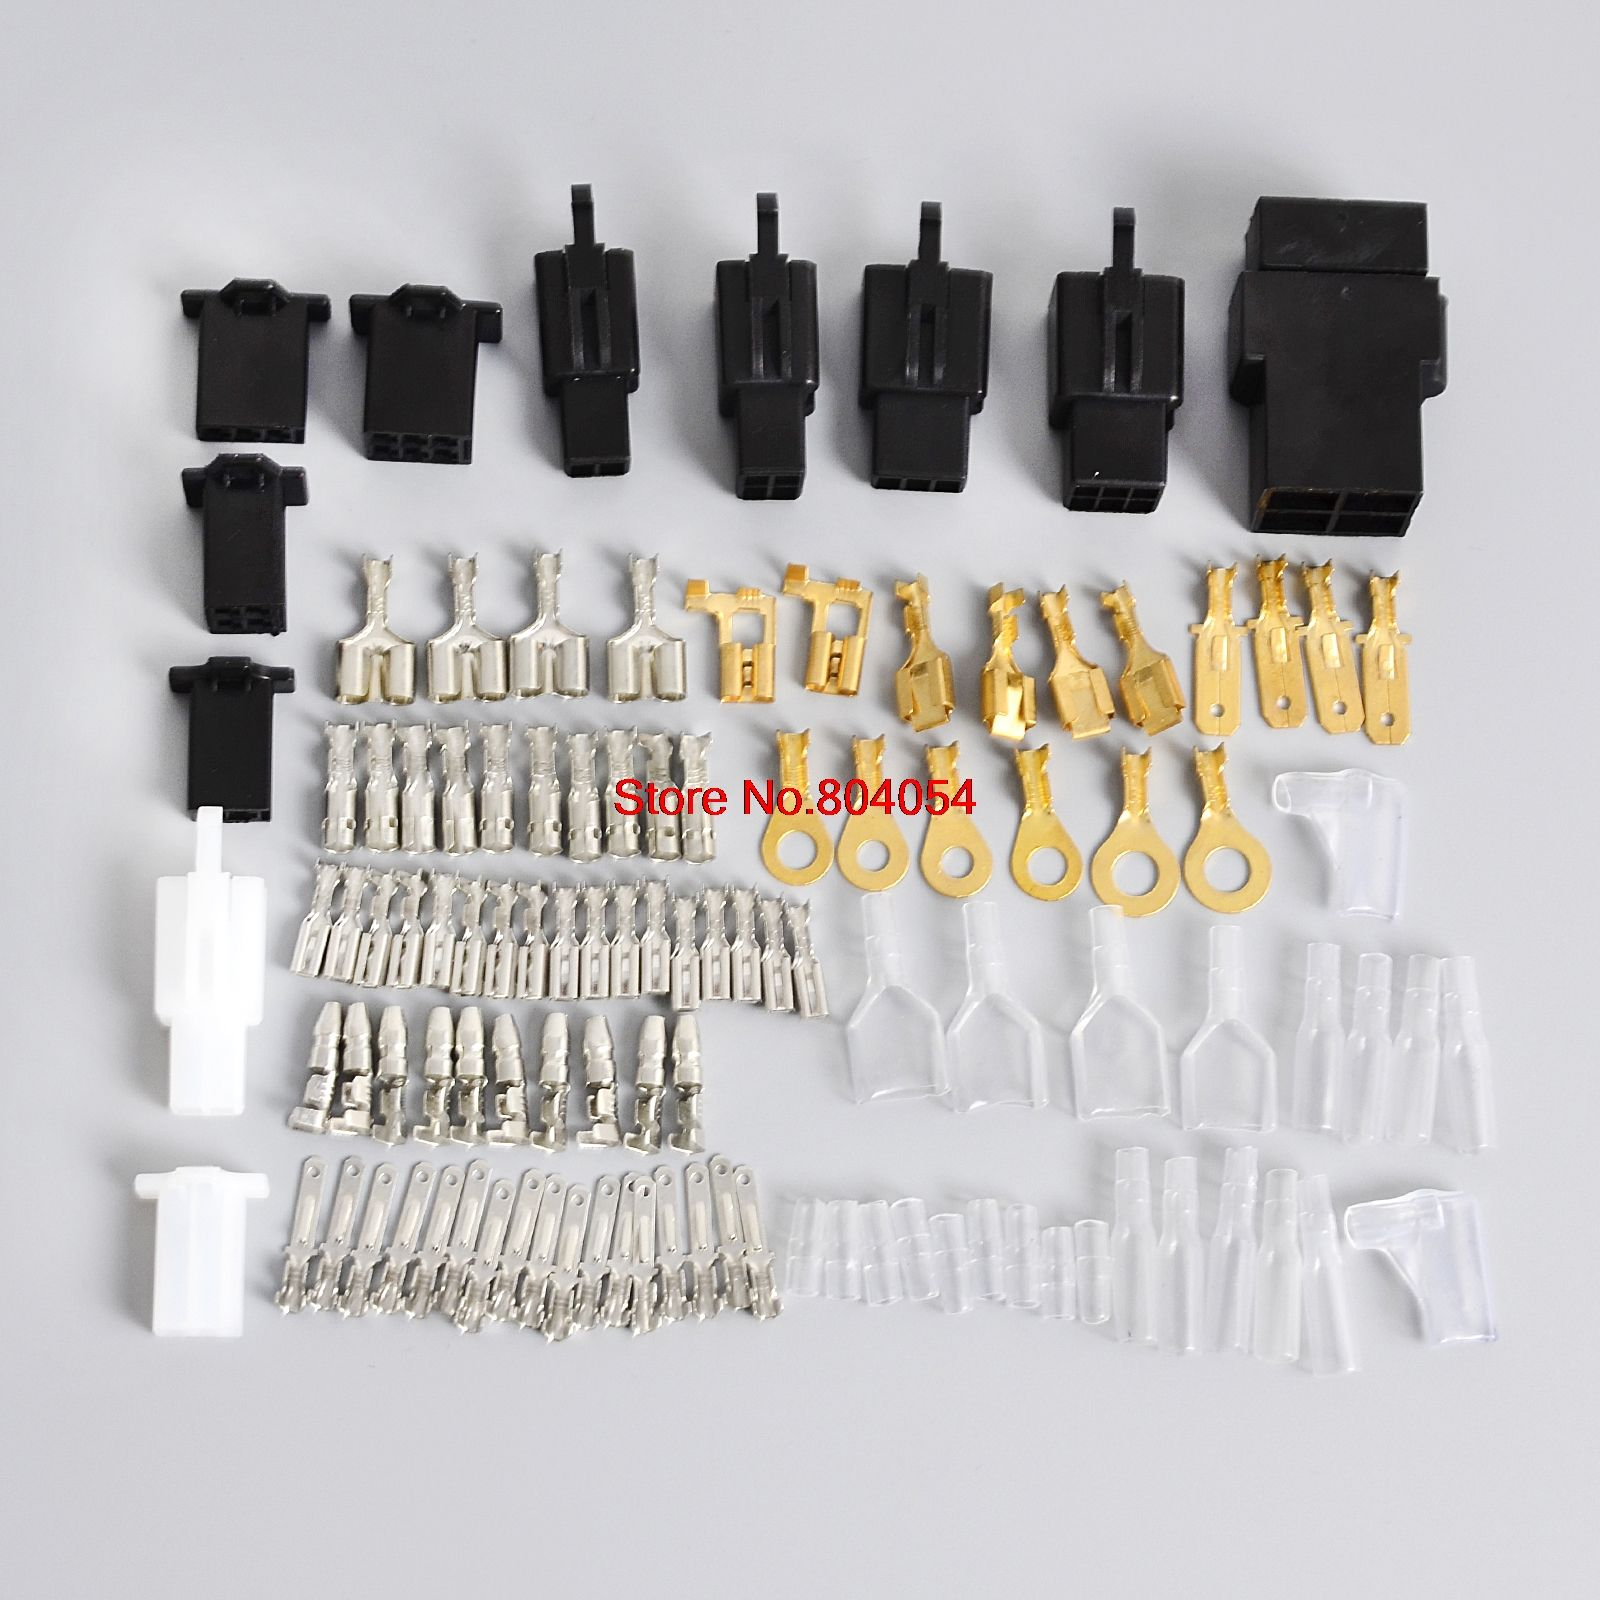 medium resolution of for honda motorcycle electrical wiring harness loom repair kit plugs bullets connectors